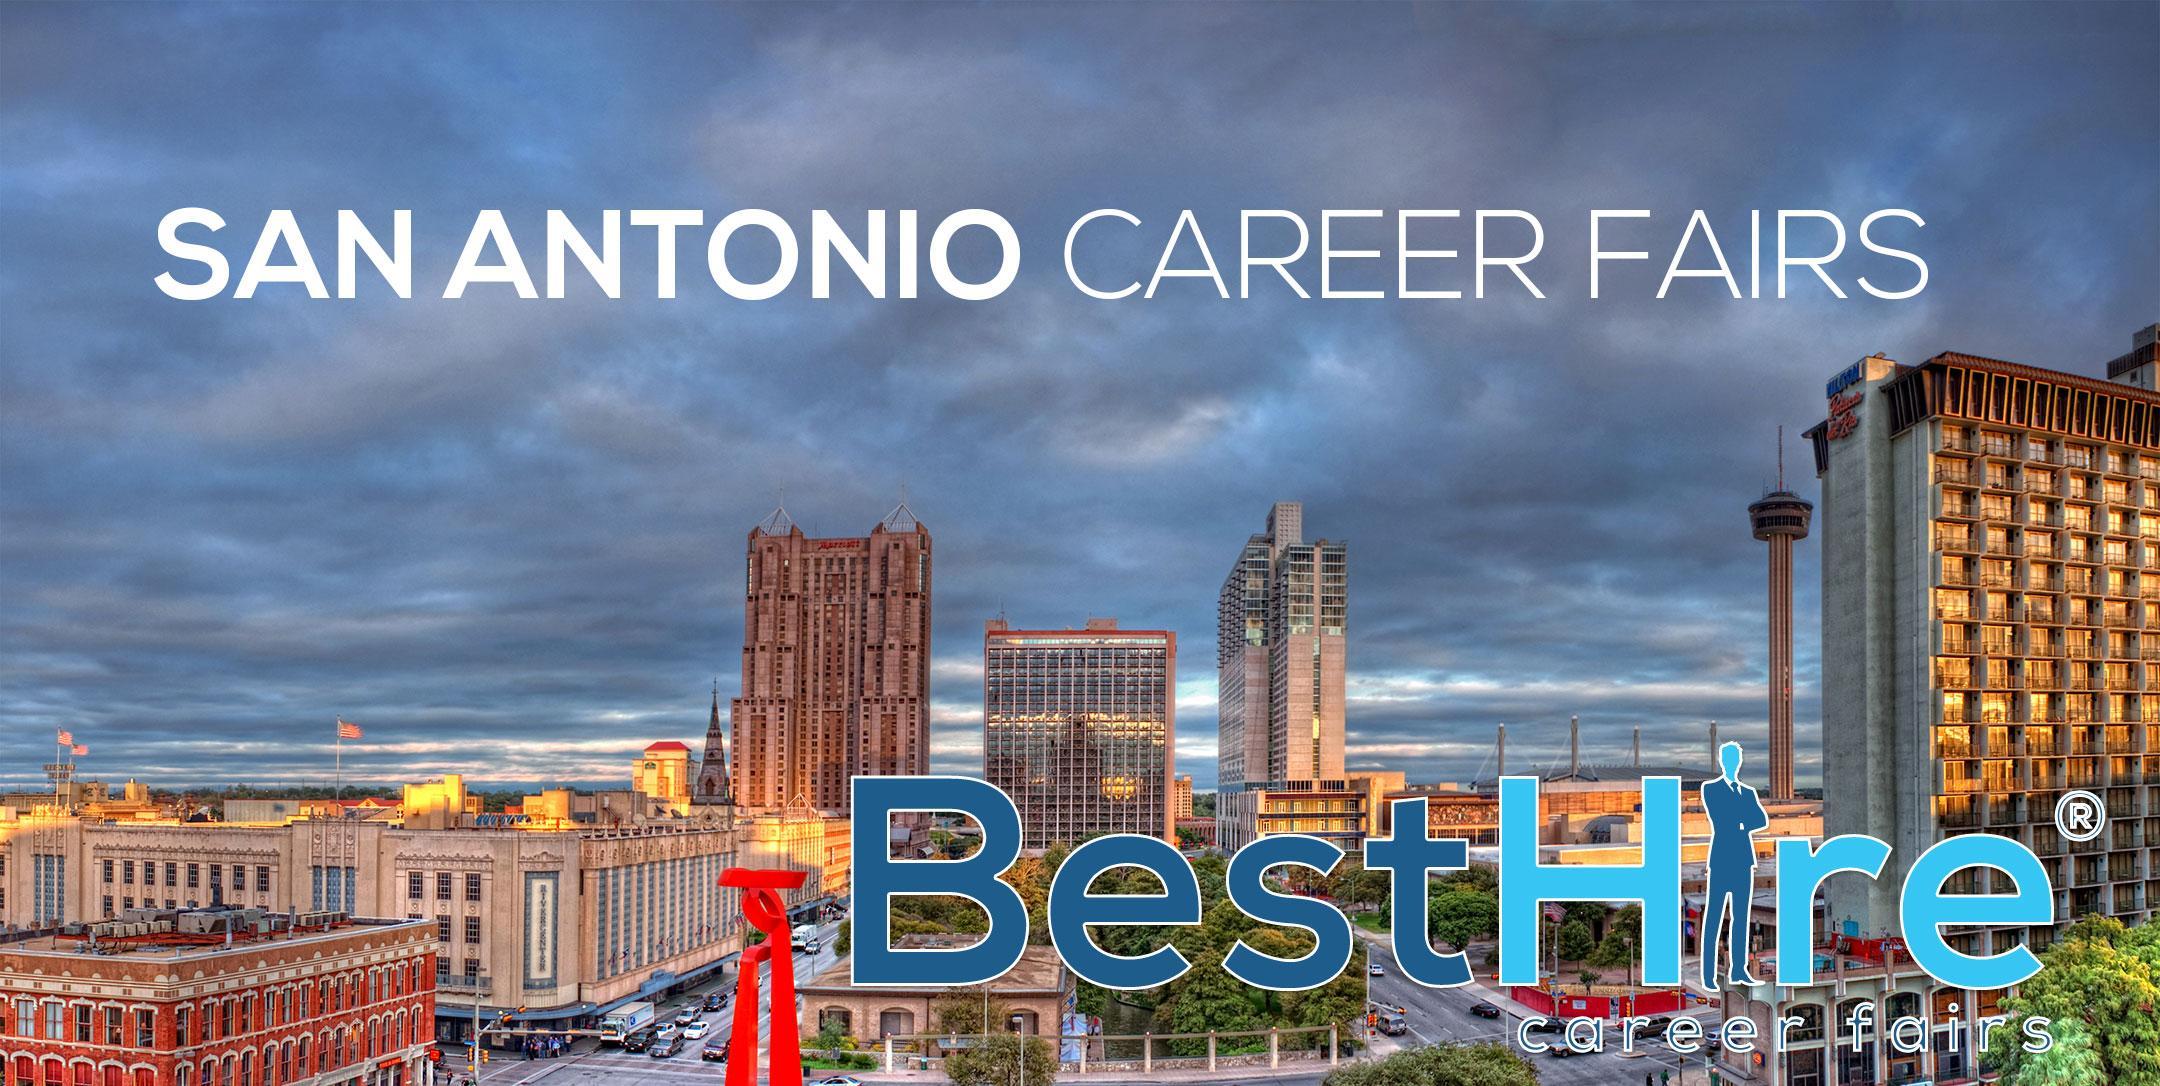 San Antonio Career Fair December 6, 2018 - Job Fairs & Hiring Events in San Antonio TX